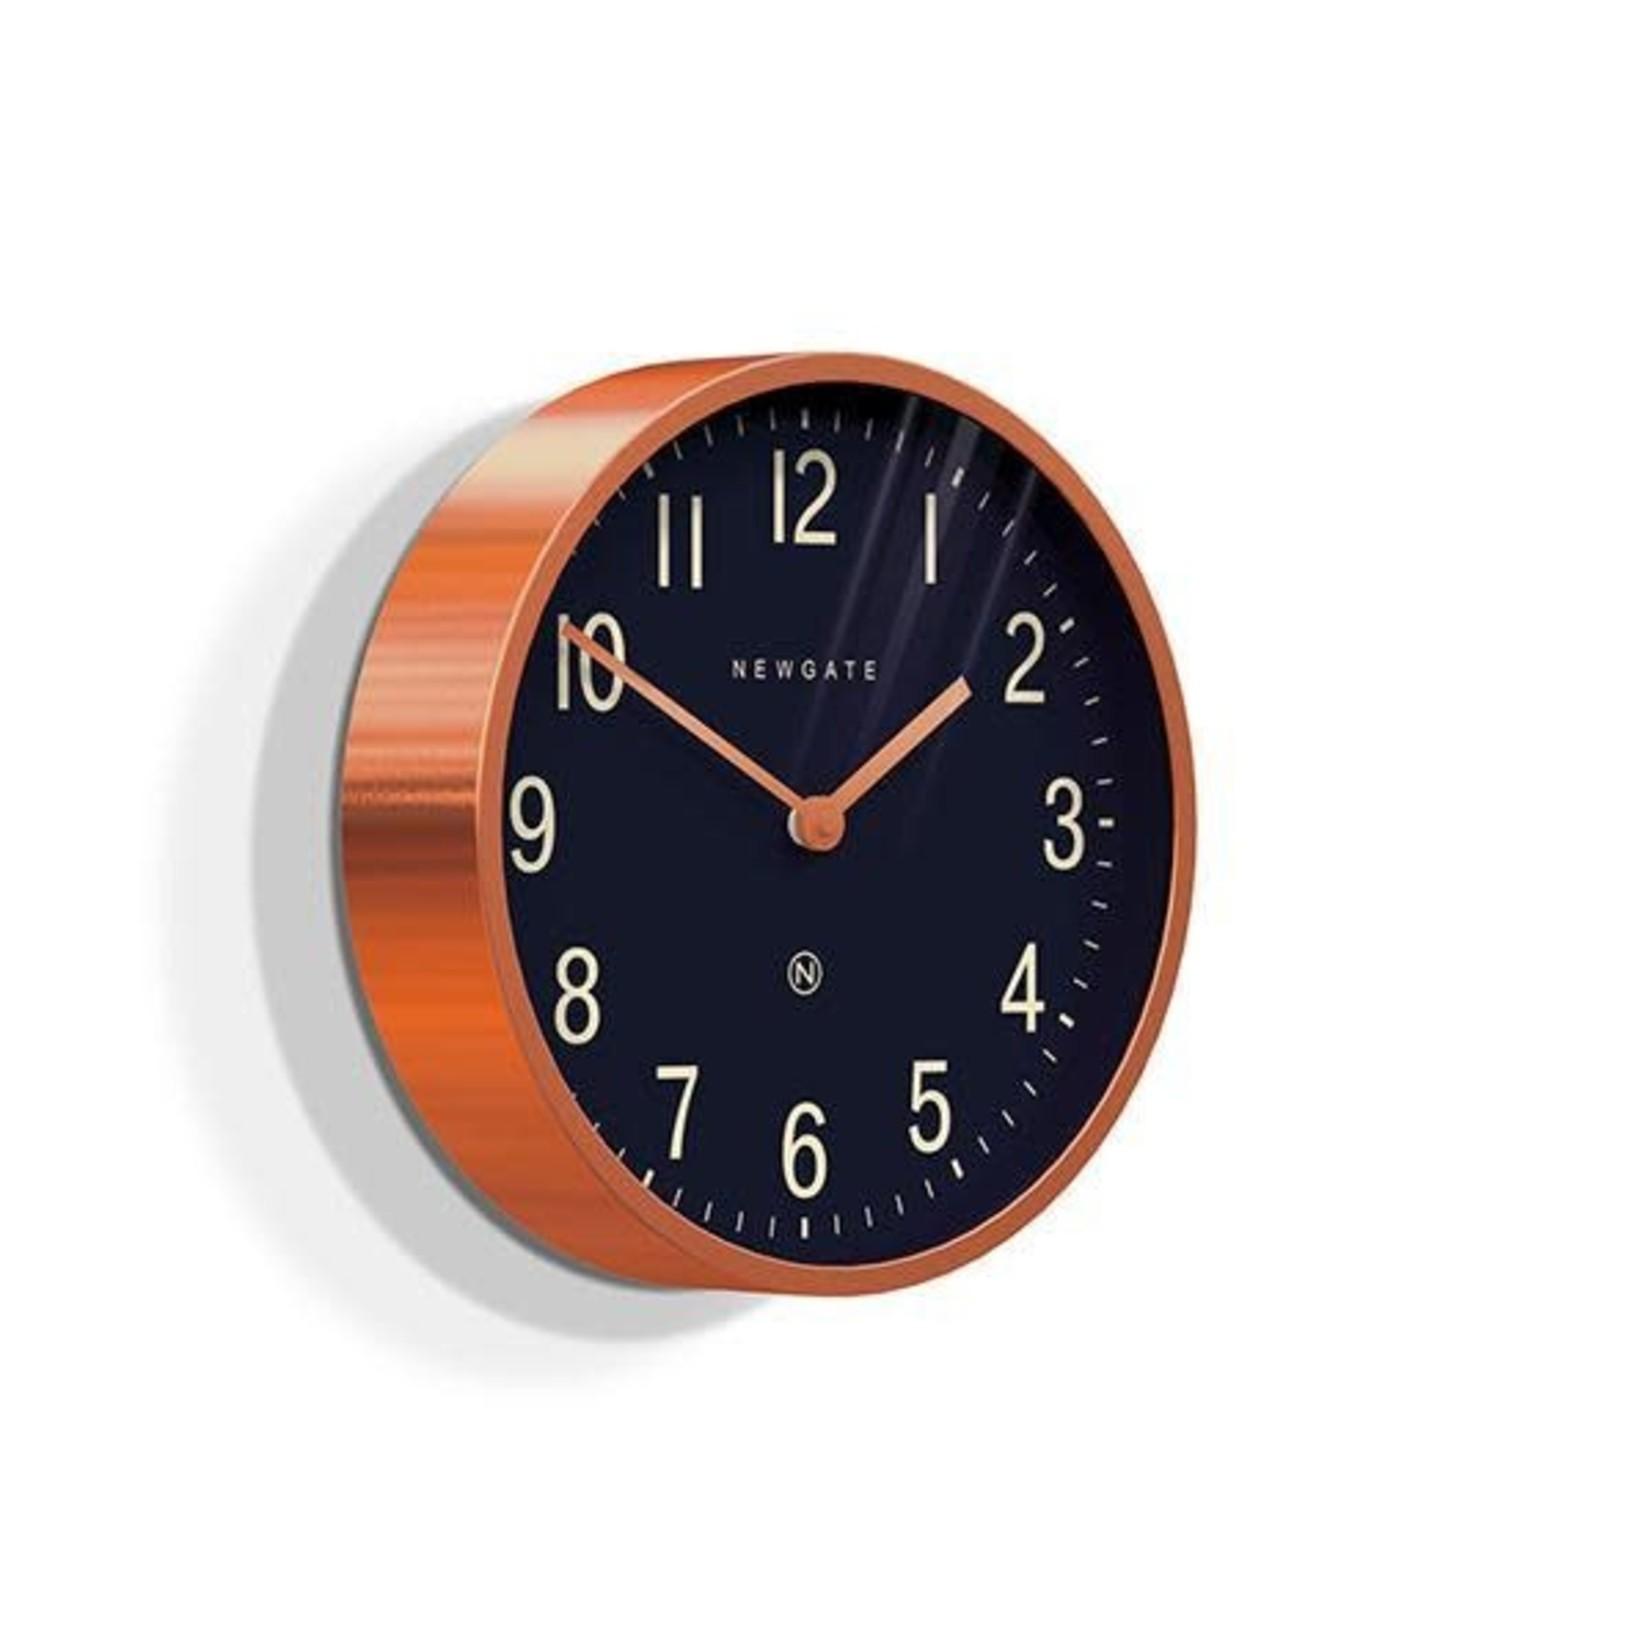 Newgate Newgate Master Edwards Clock  Copper